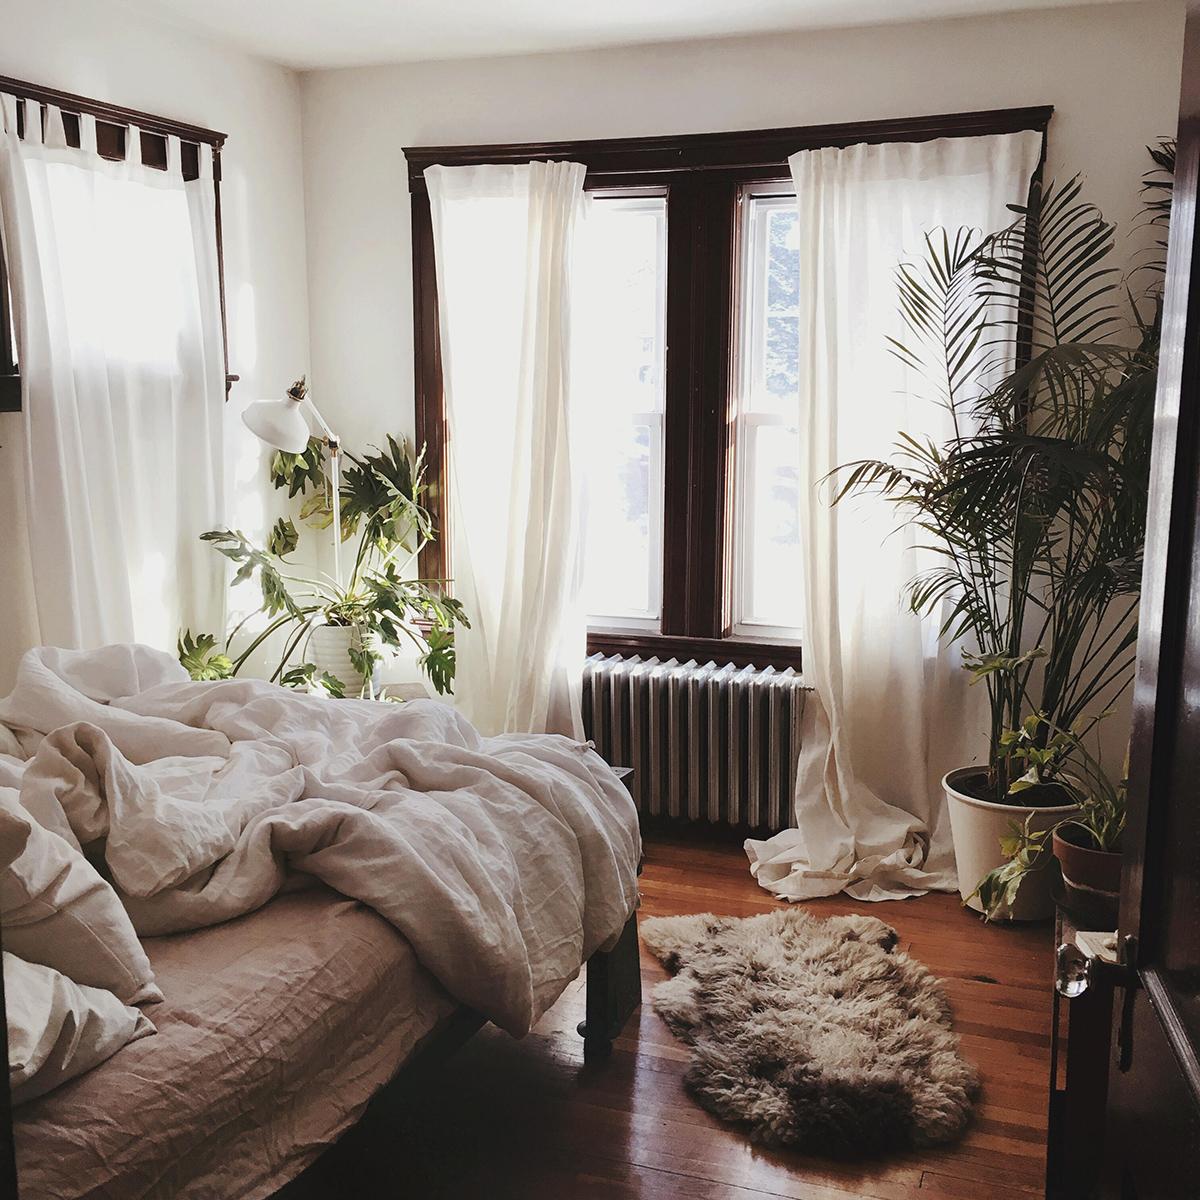 House tour a cozy minimalist apartment in jamaica plain for Minimalist home tour